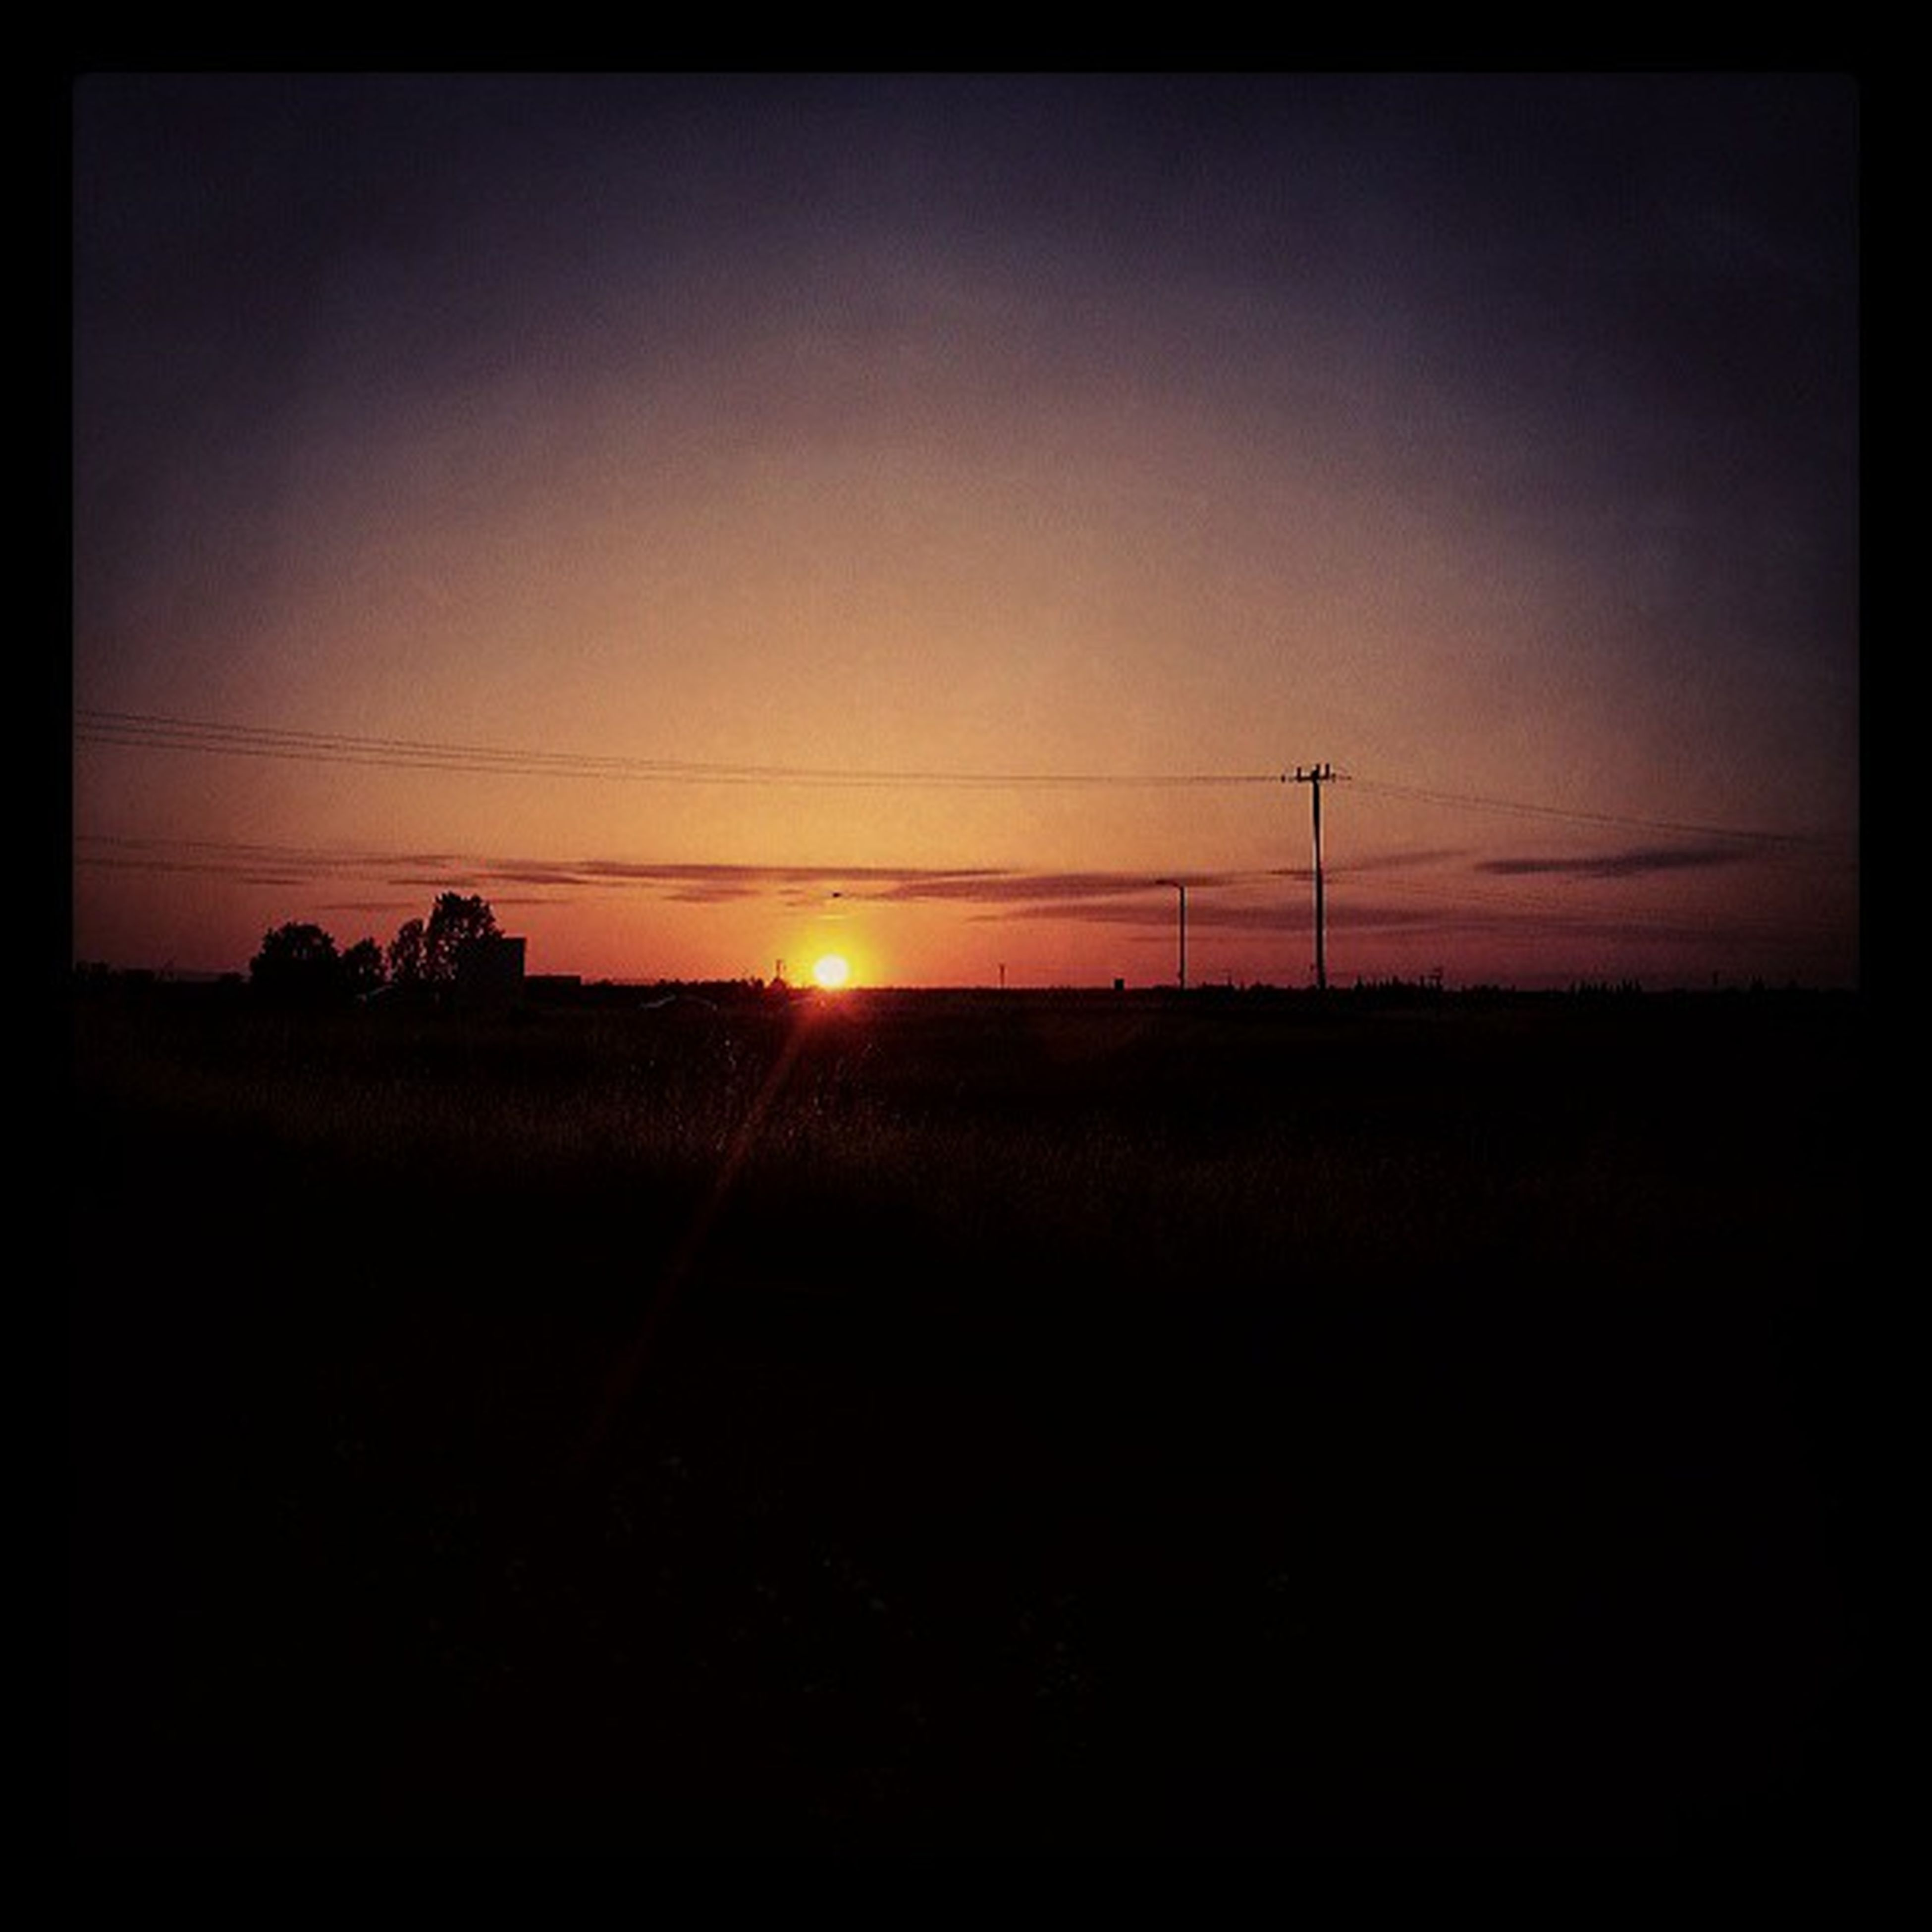 sunset, tranquil scene, sun, tranquility, silhouette, landscape, scenics, field, beauty in nature, sky, electricity pylon, nature, power line, transfer print, orange color, auto post production filter, rural scene, idyllic, sunlight, outdoors